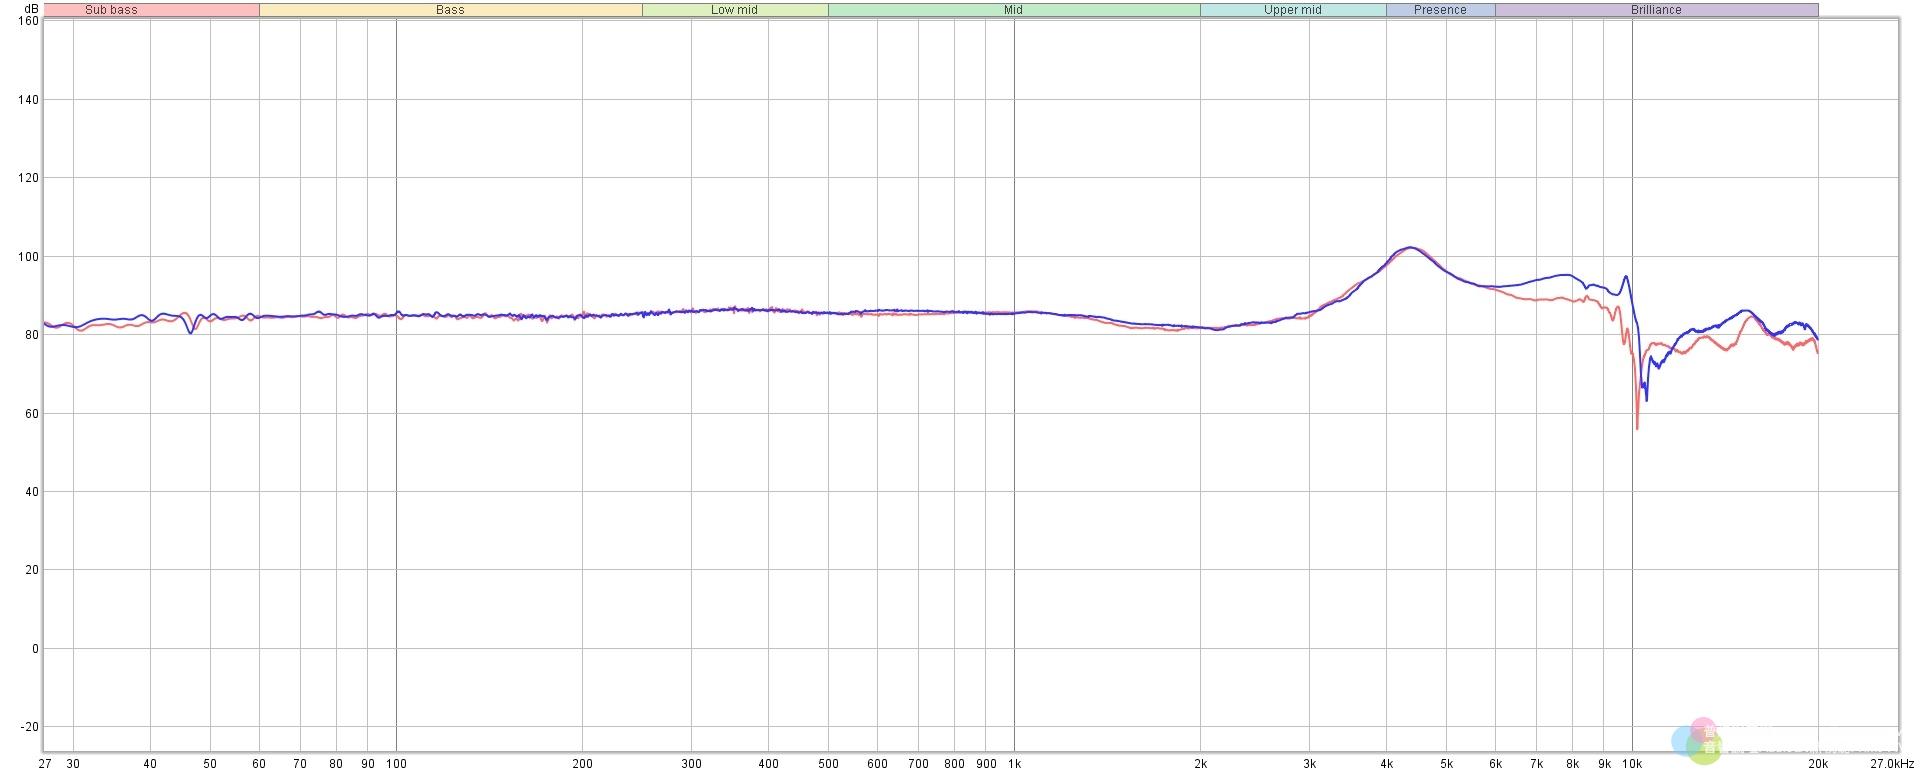 T+A Solitaire P平面振膜耳機+HA 200耳擴/DAC:目前所聞最迷人的耳機系統! 170718qjoo8gqq9gzc933y.jpg HA 200 平面振膜耳機 耳擴 DAC DSD 鈦孚